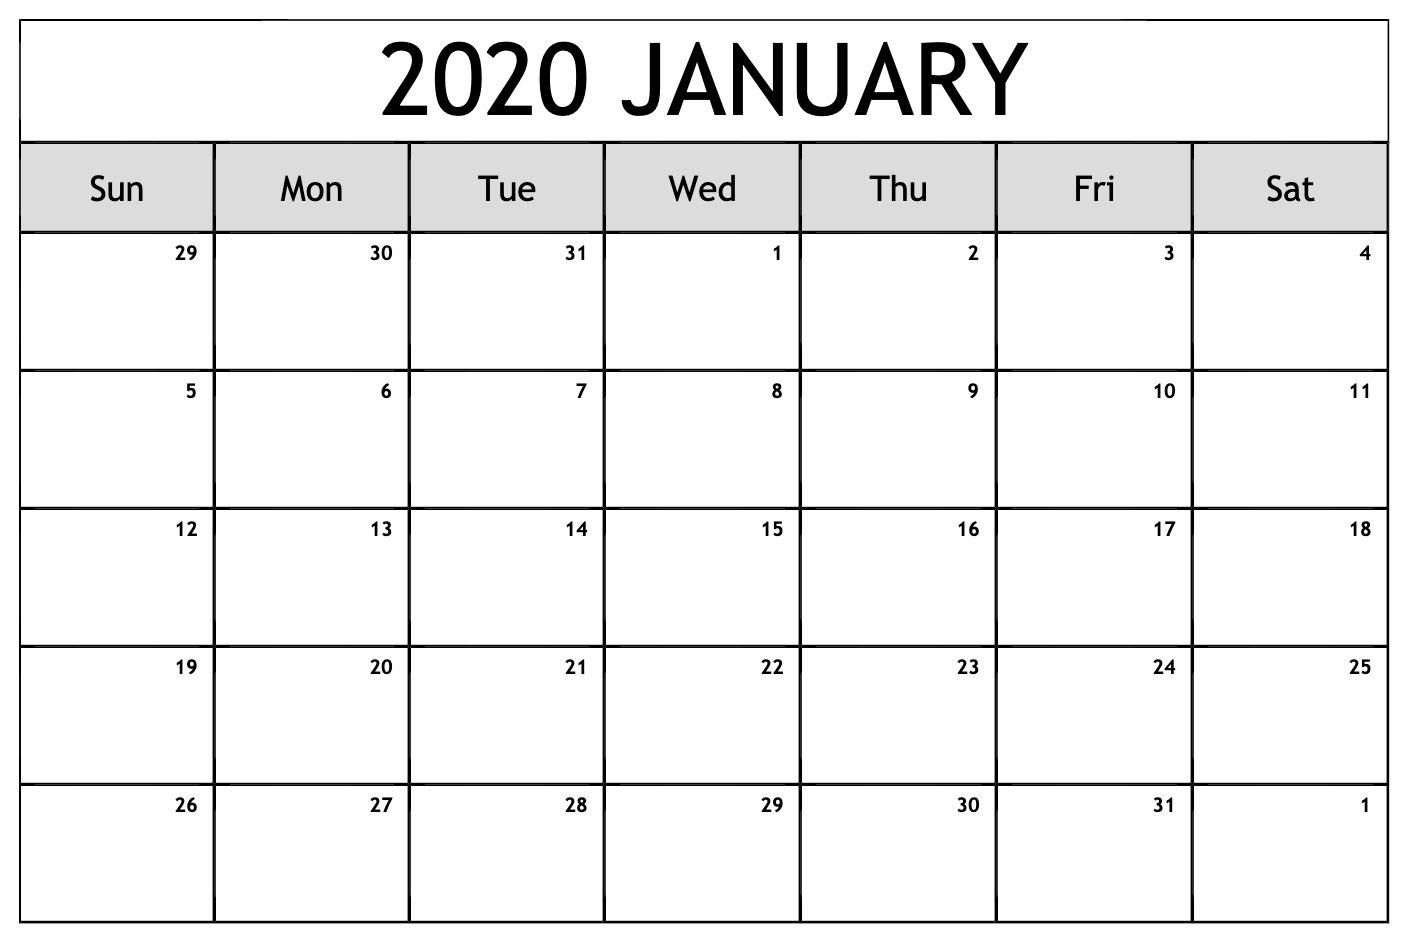 Free Editable January Calendar 2020 Blank Template within Blank January Calendar 2020